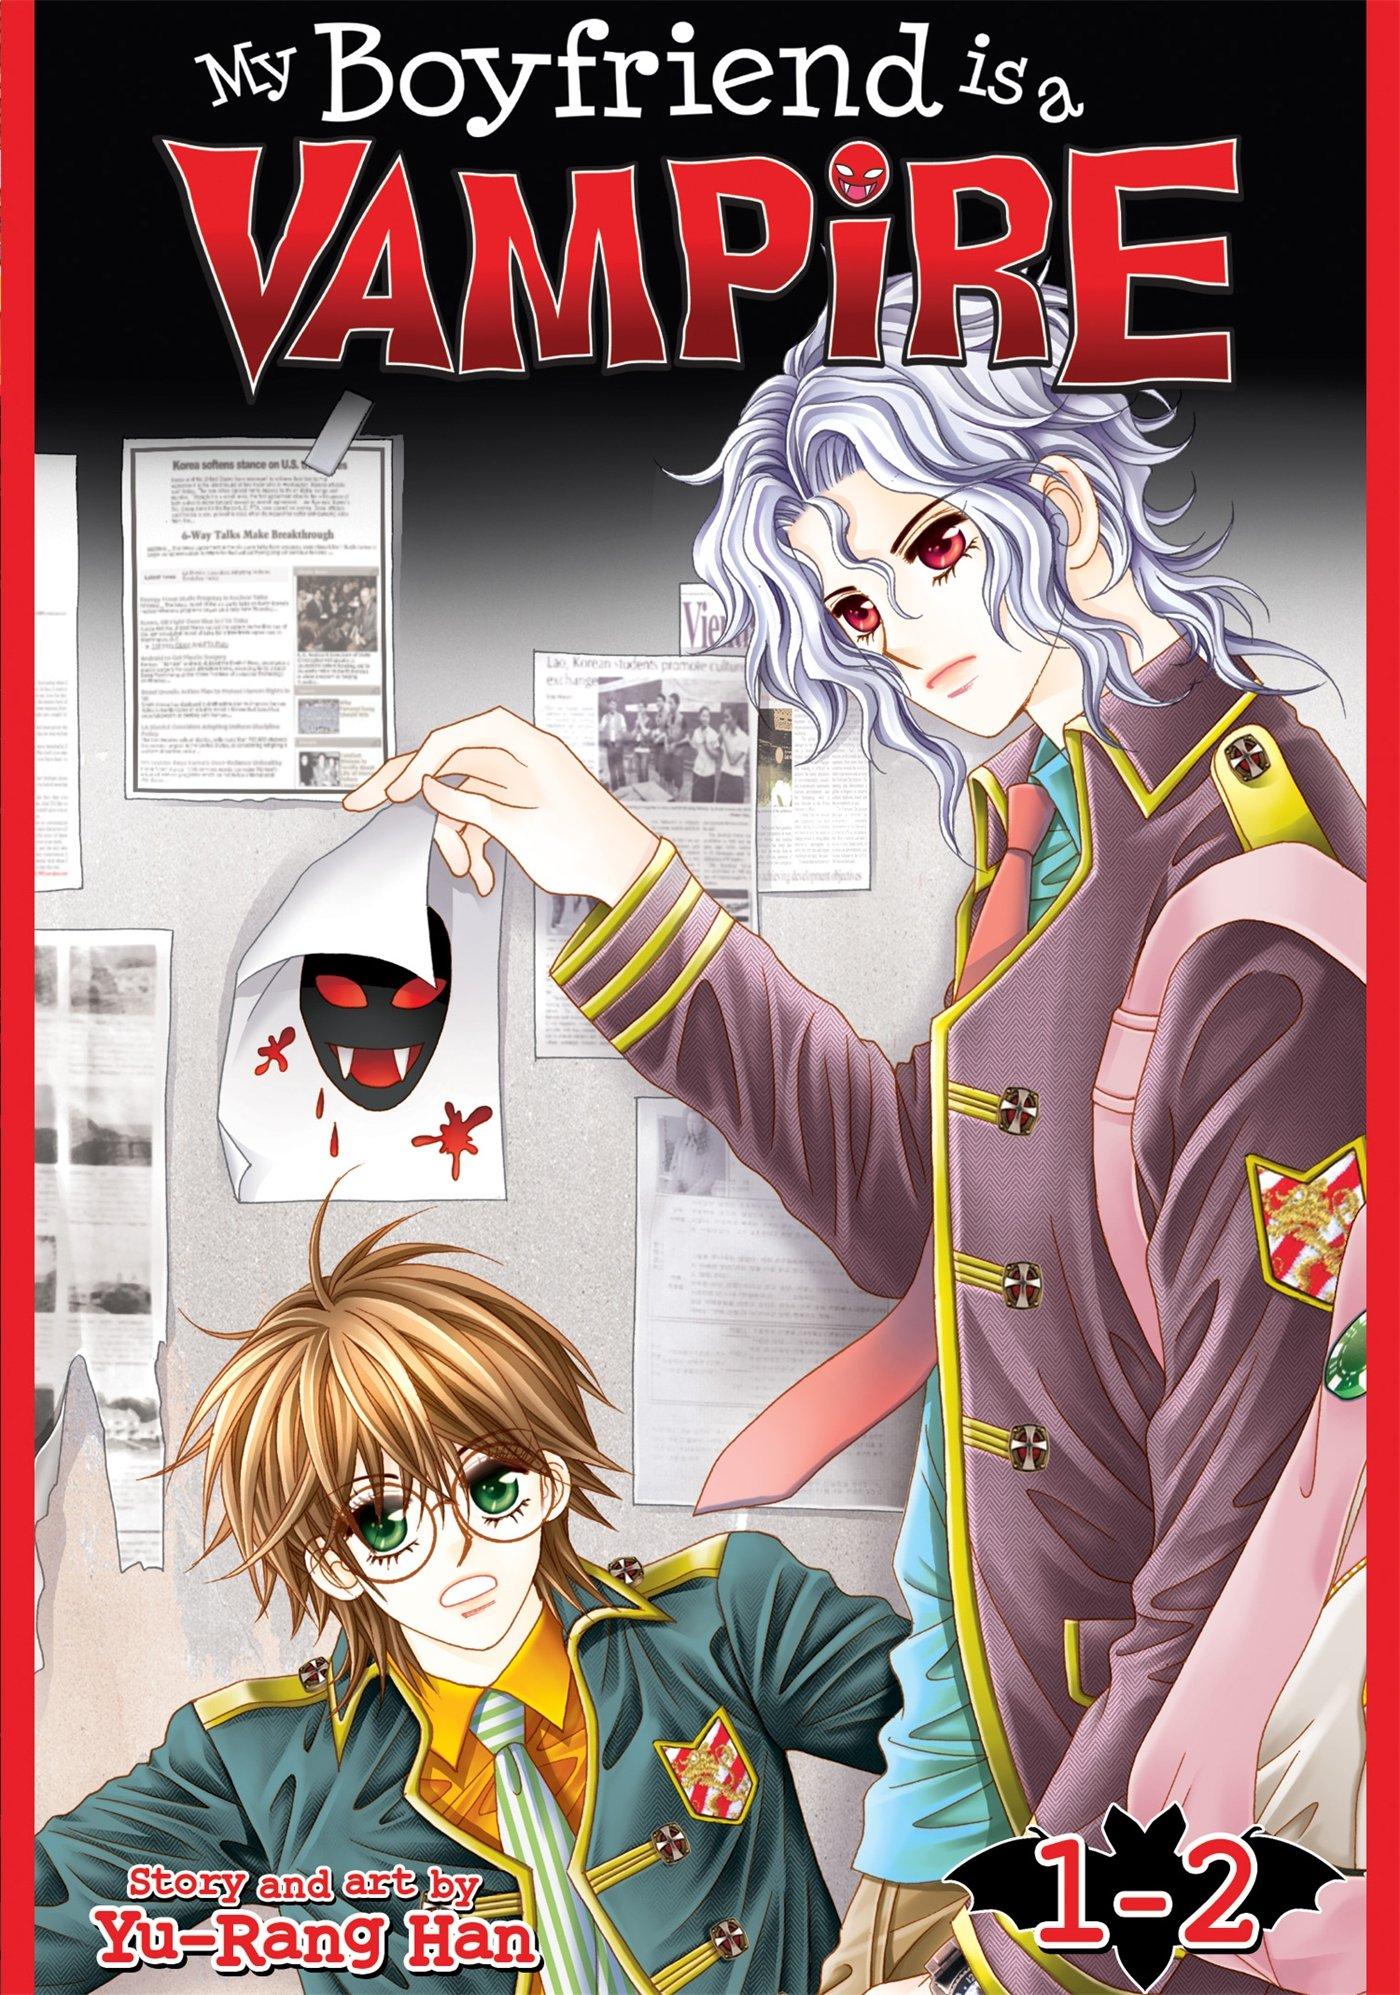 My Boyfriend is a Vampire, vol 1-2: Amazon co uk: Han Yu-Rang: Books